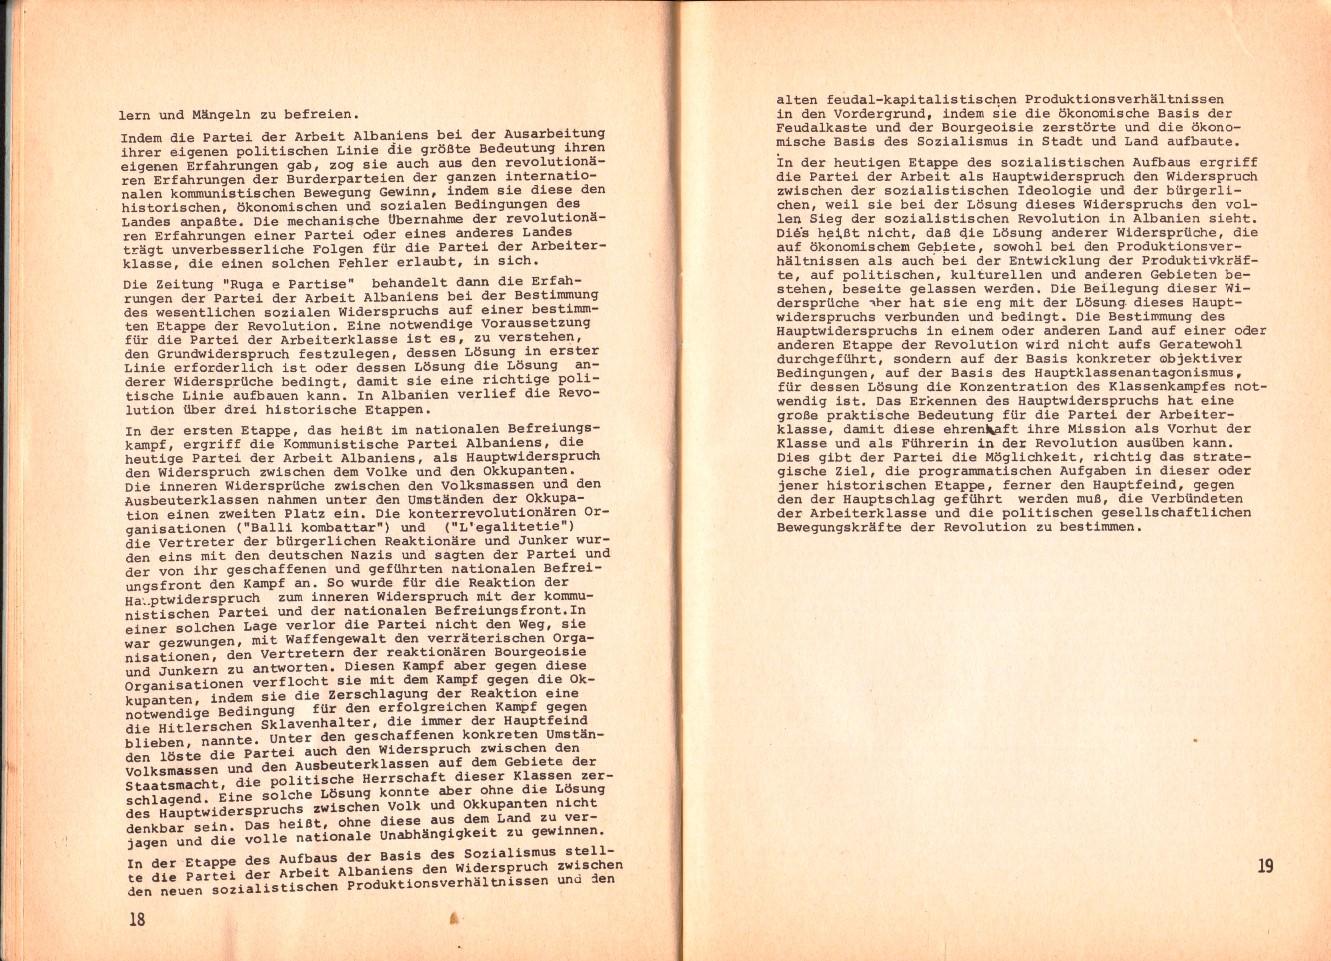 ZB_Parteiarbeiter_1971_10_11